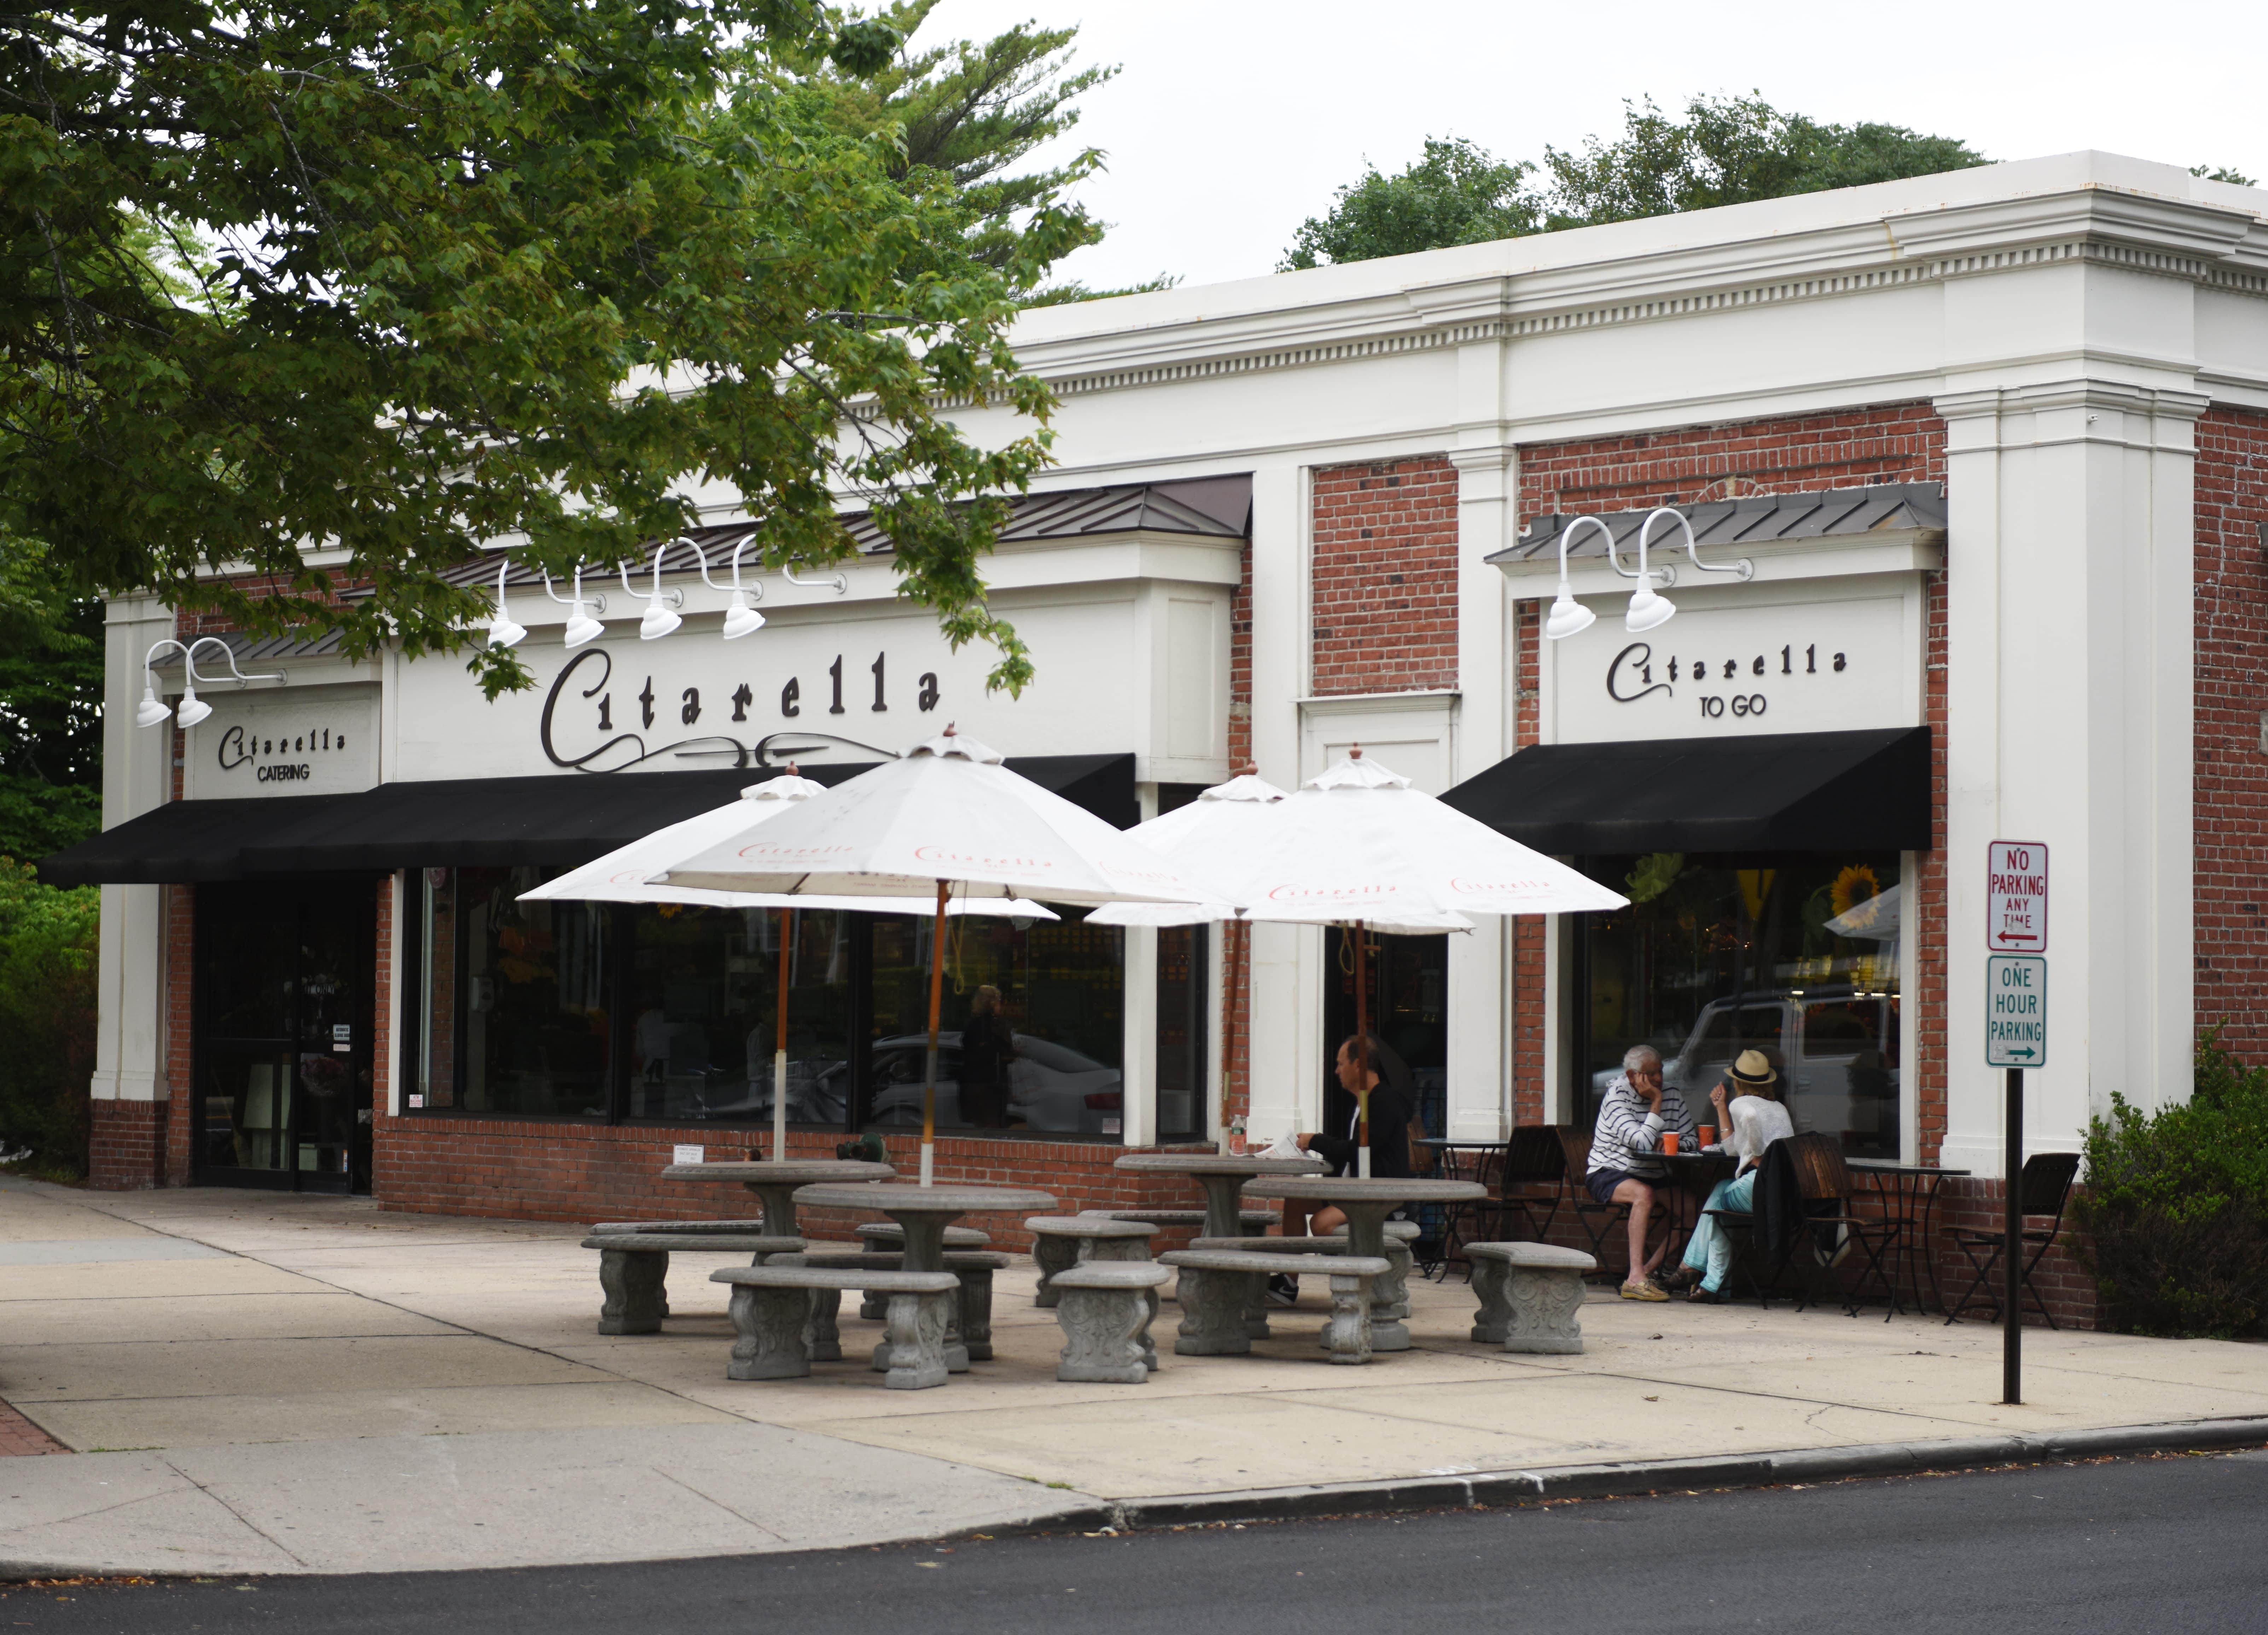 Citarella Gourmet Market - East Hampton image 1